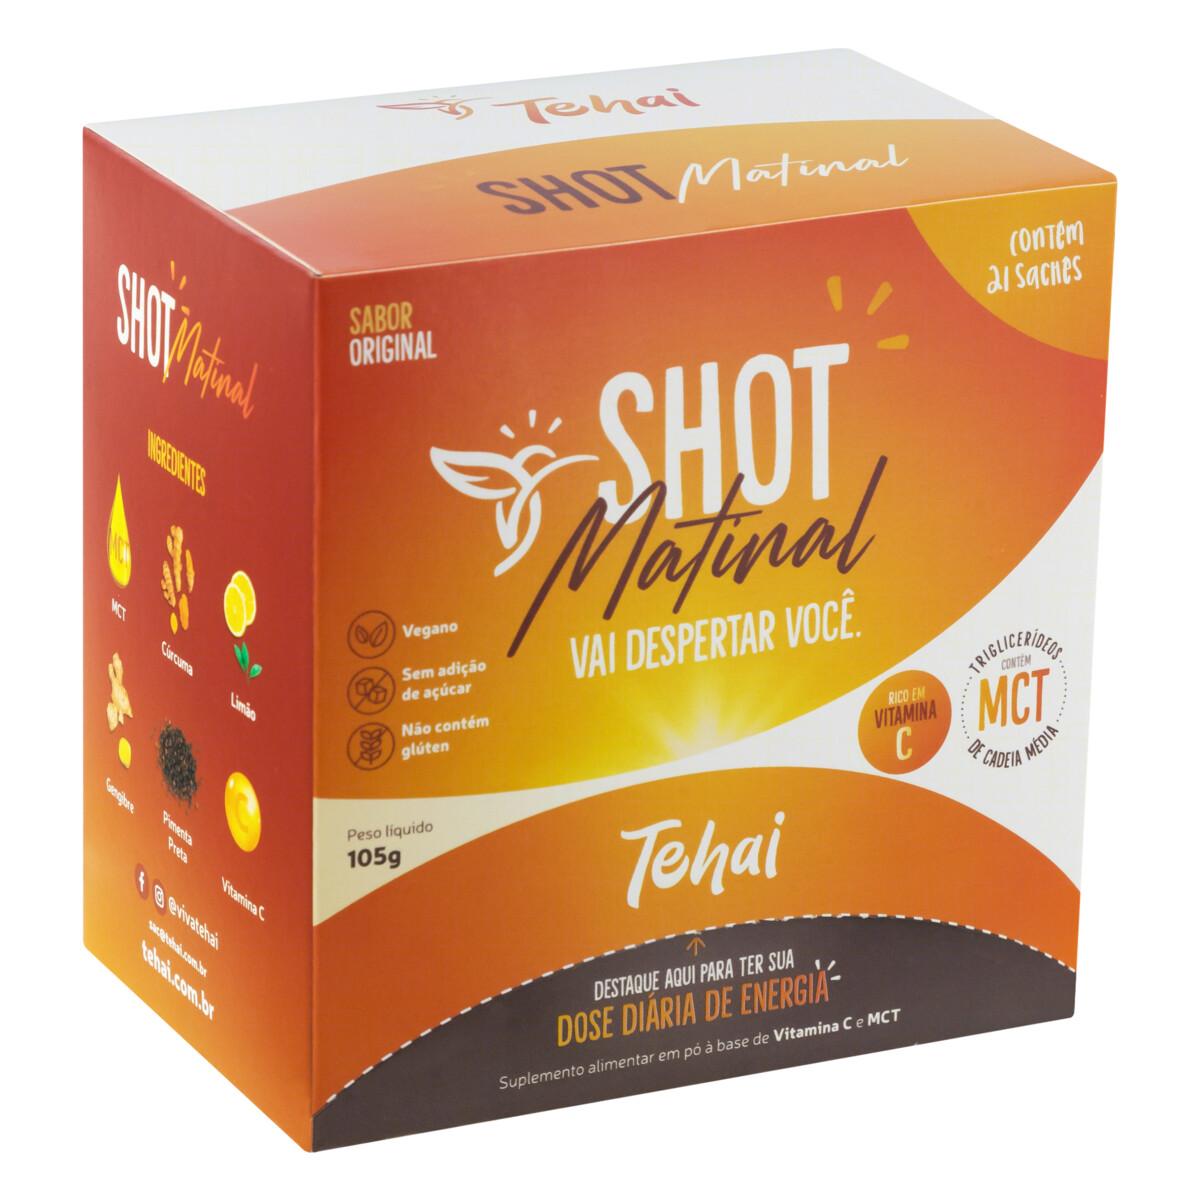 2 meses - Shot Matinal Tehai - Suplemento de MCT e Vitamina C